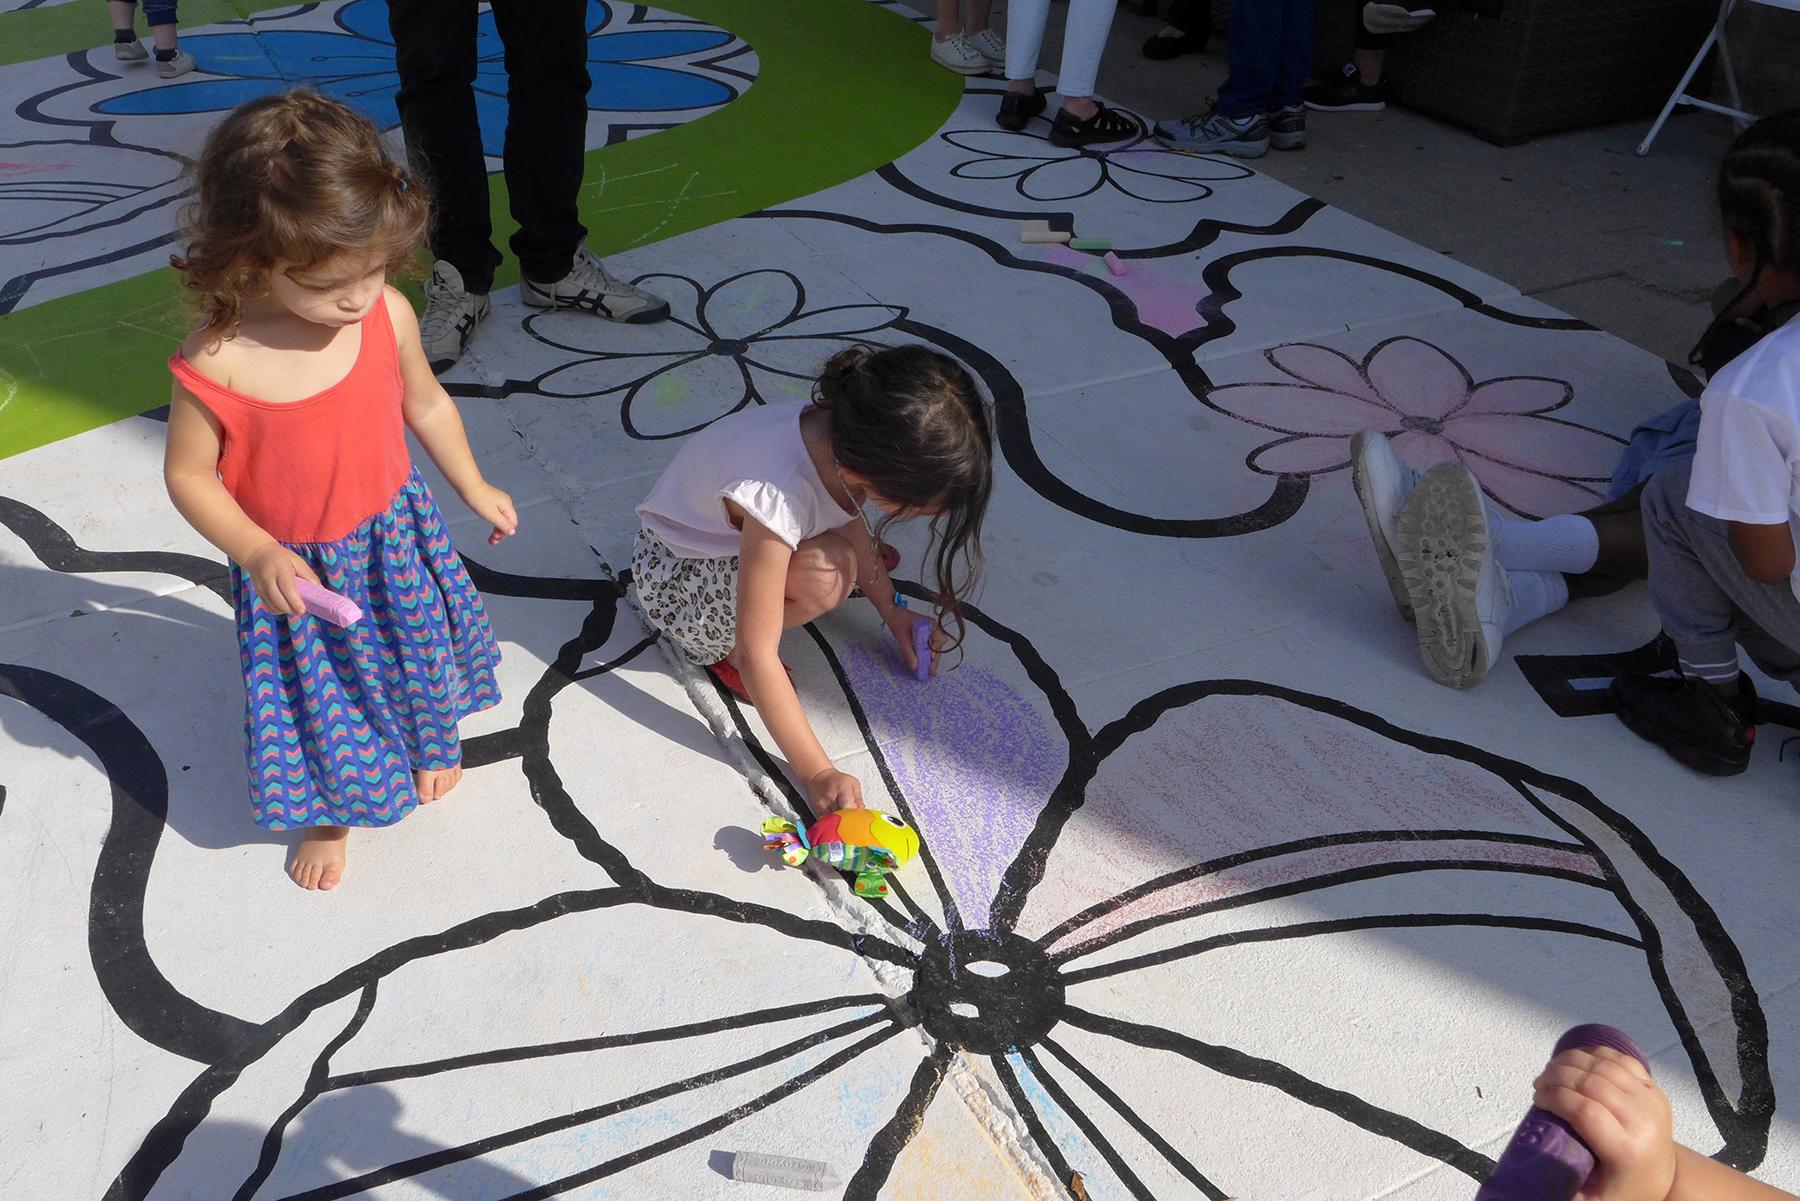 Coloring Book Plaza